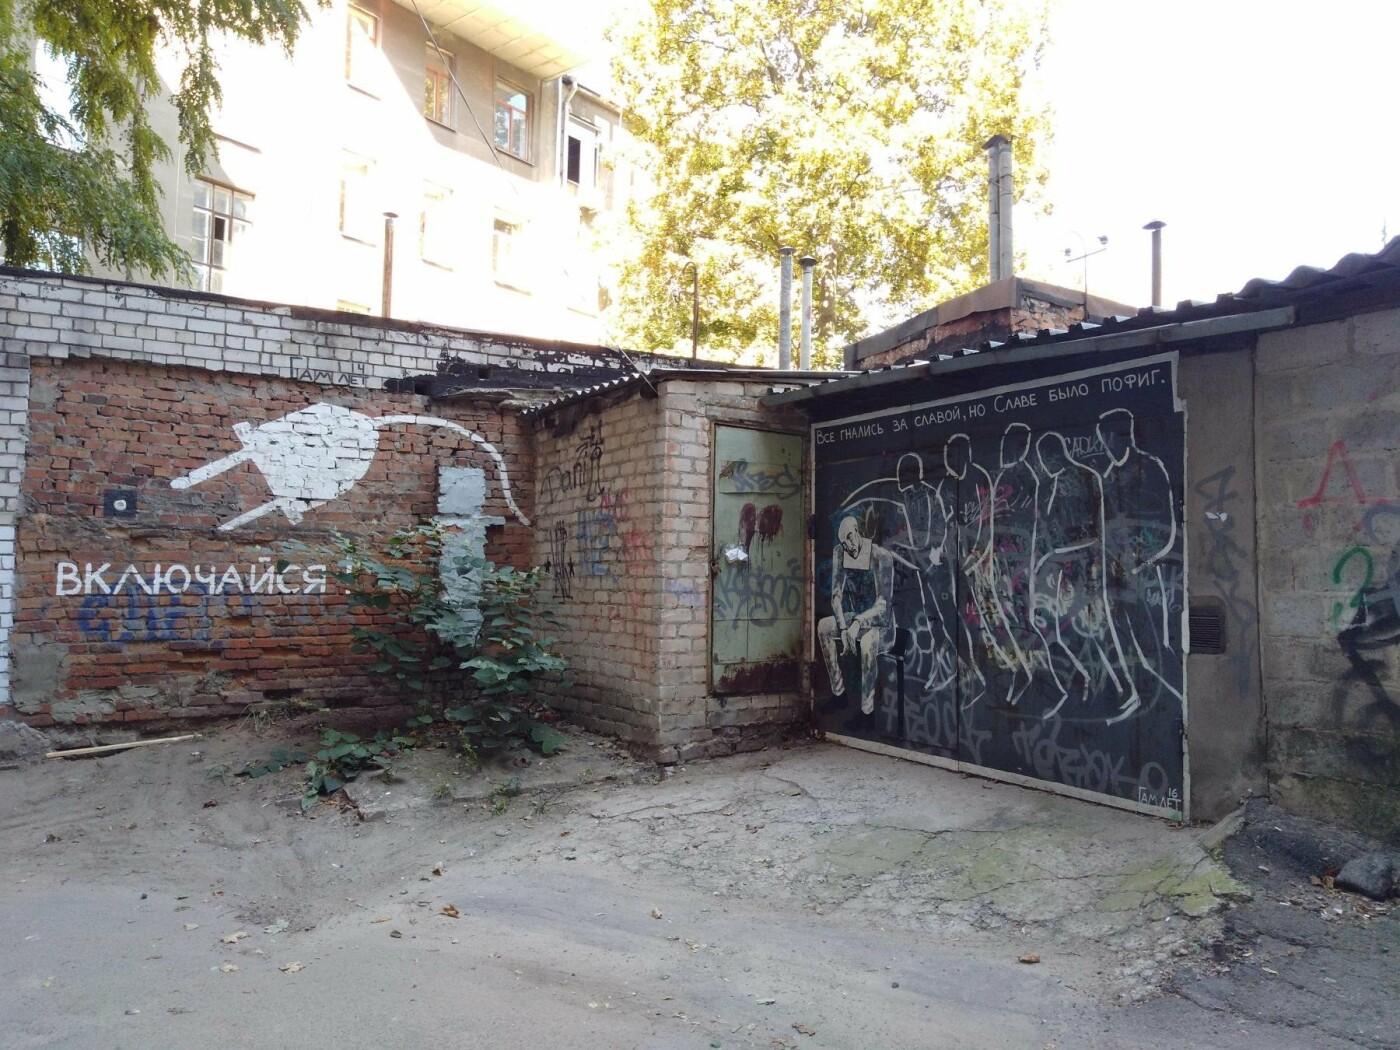 Стрит-арт Гамлета в Харькове: ТОП-10 граффити художника, - ФОТО, фото-24